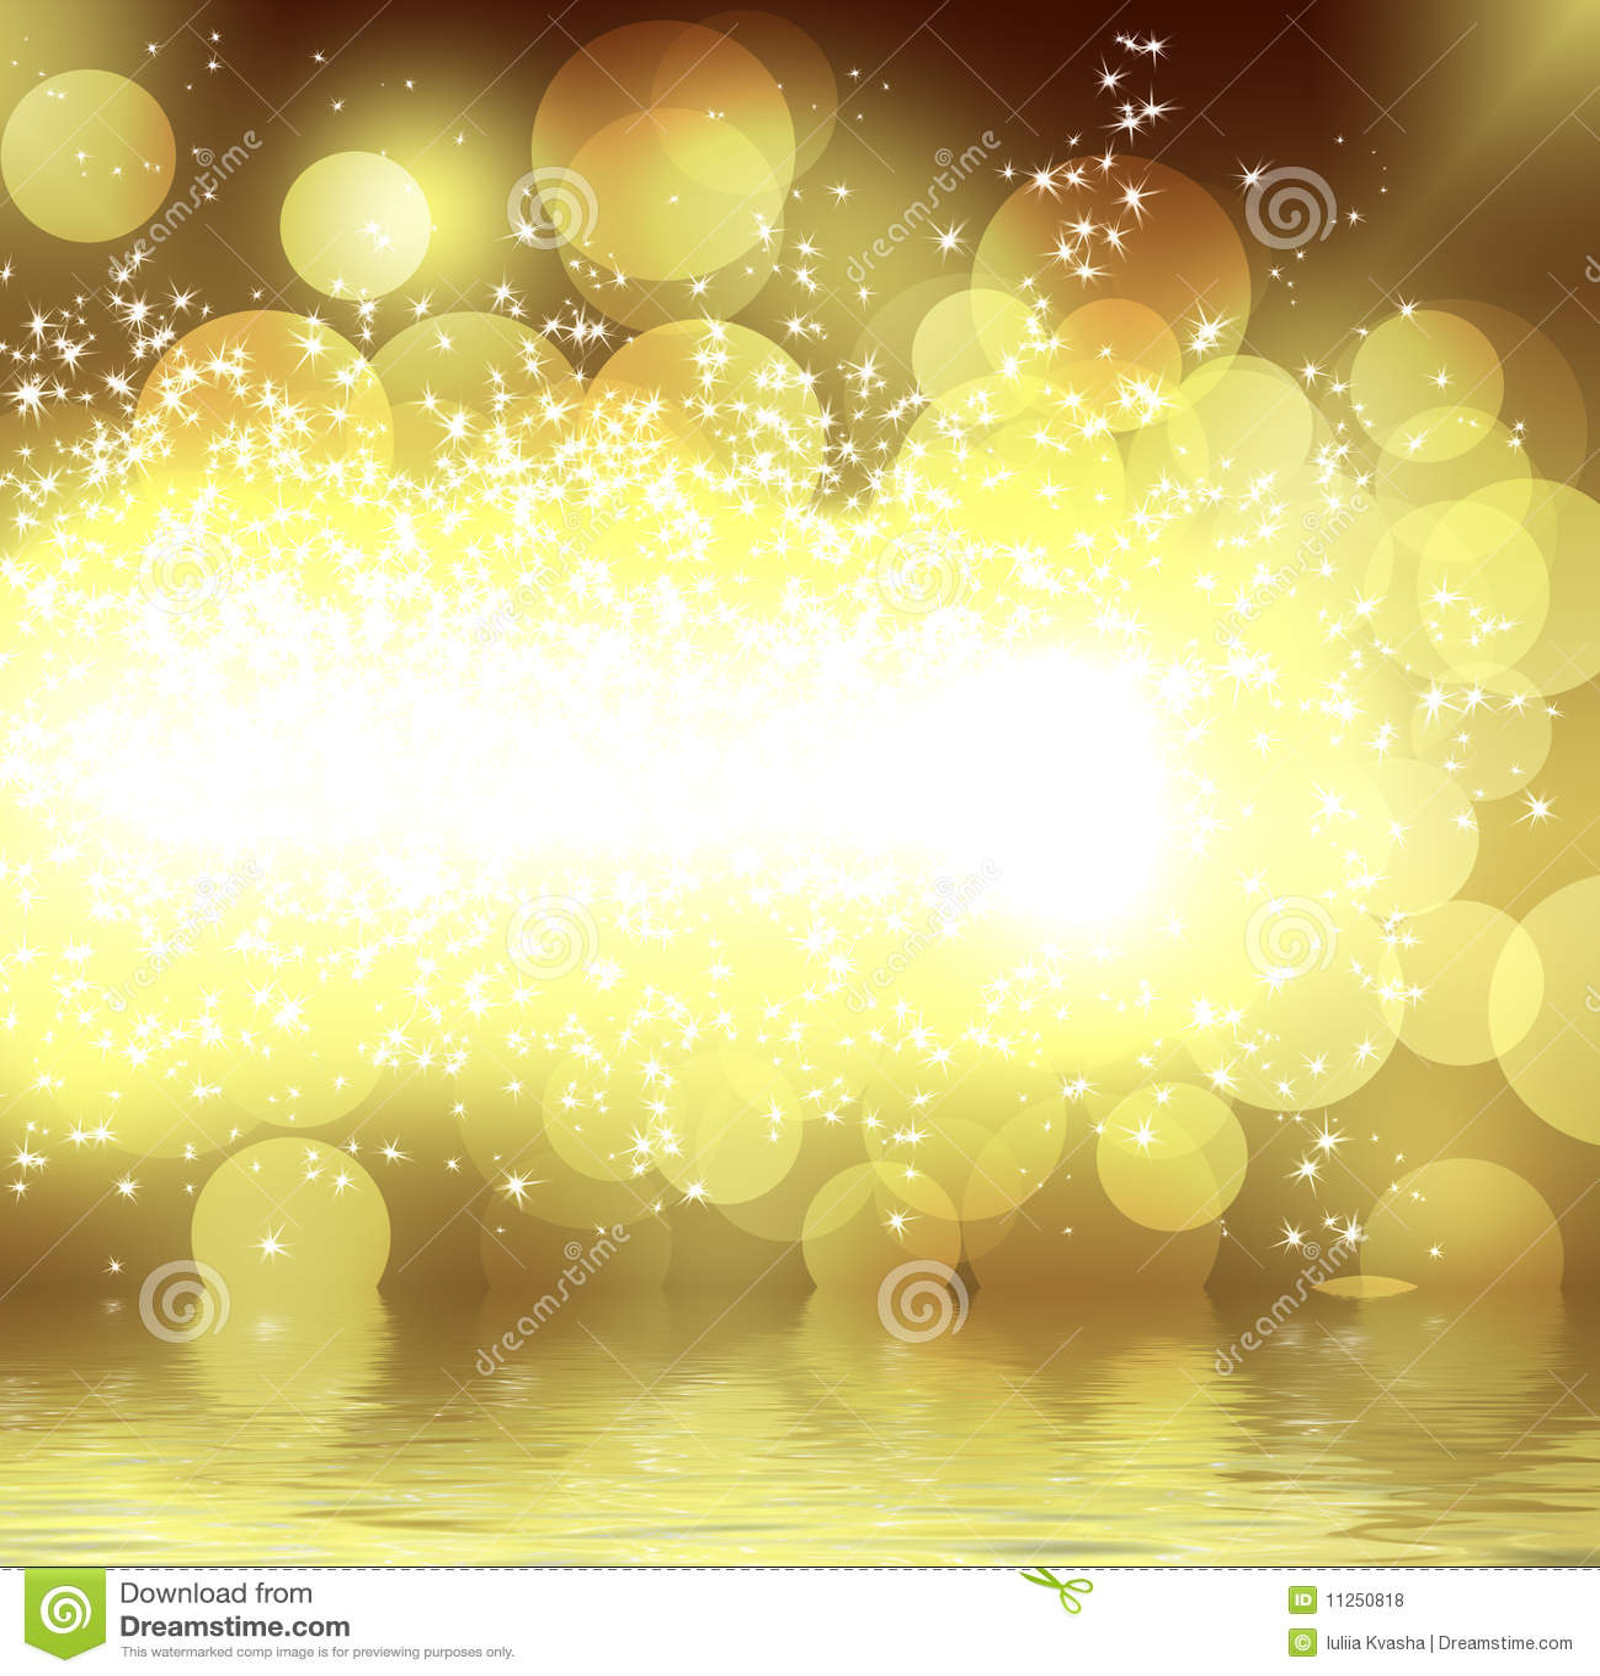 Glitter Wallpaper Hd Gold Glitter On A Dark Background Royalty Free Stock